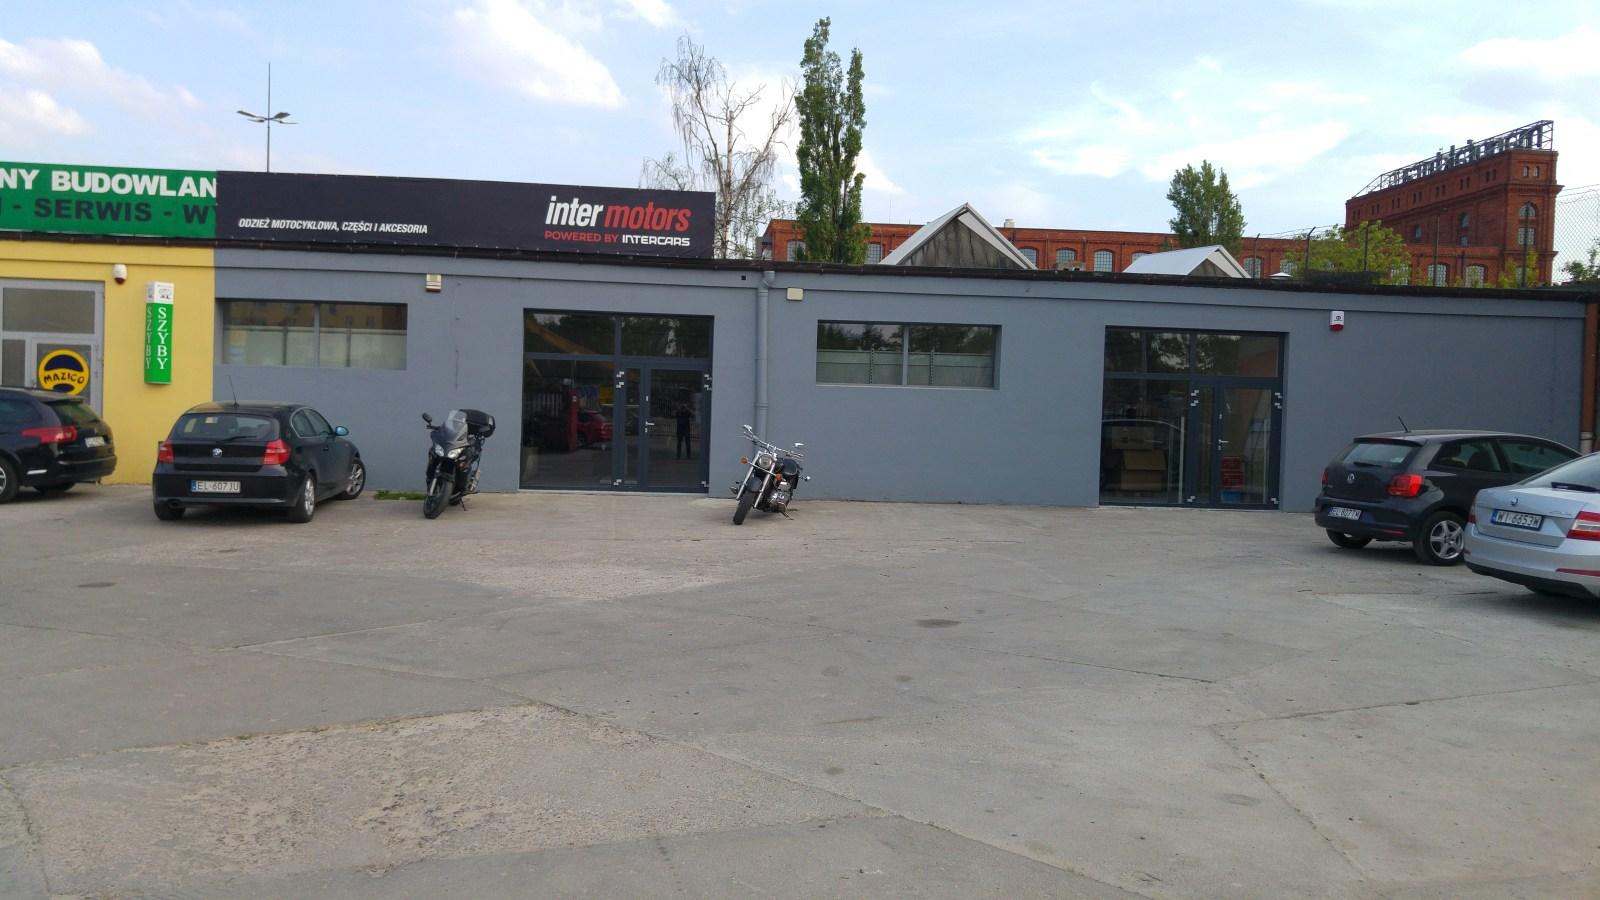 Sklep Inter Motors w Lodzi 15